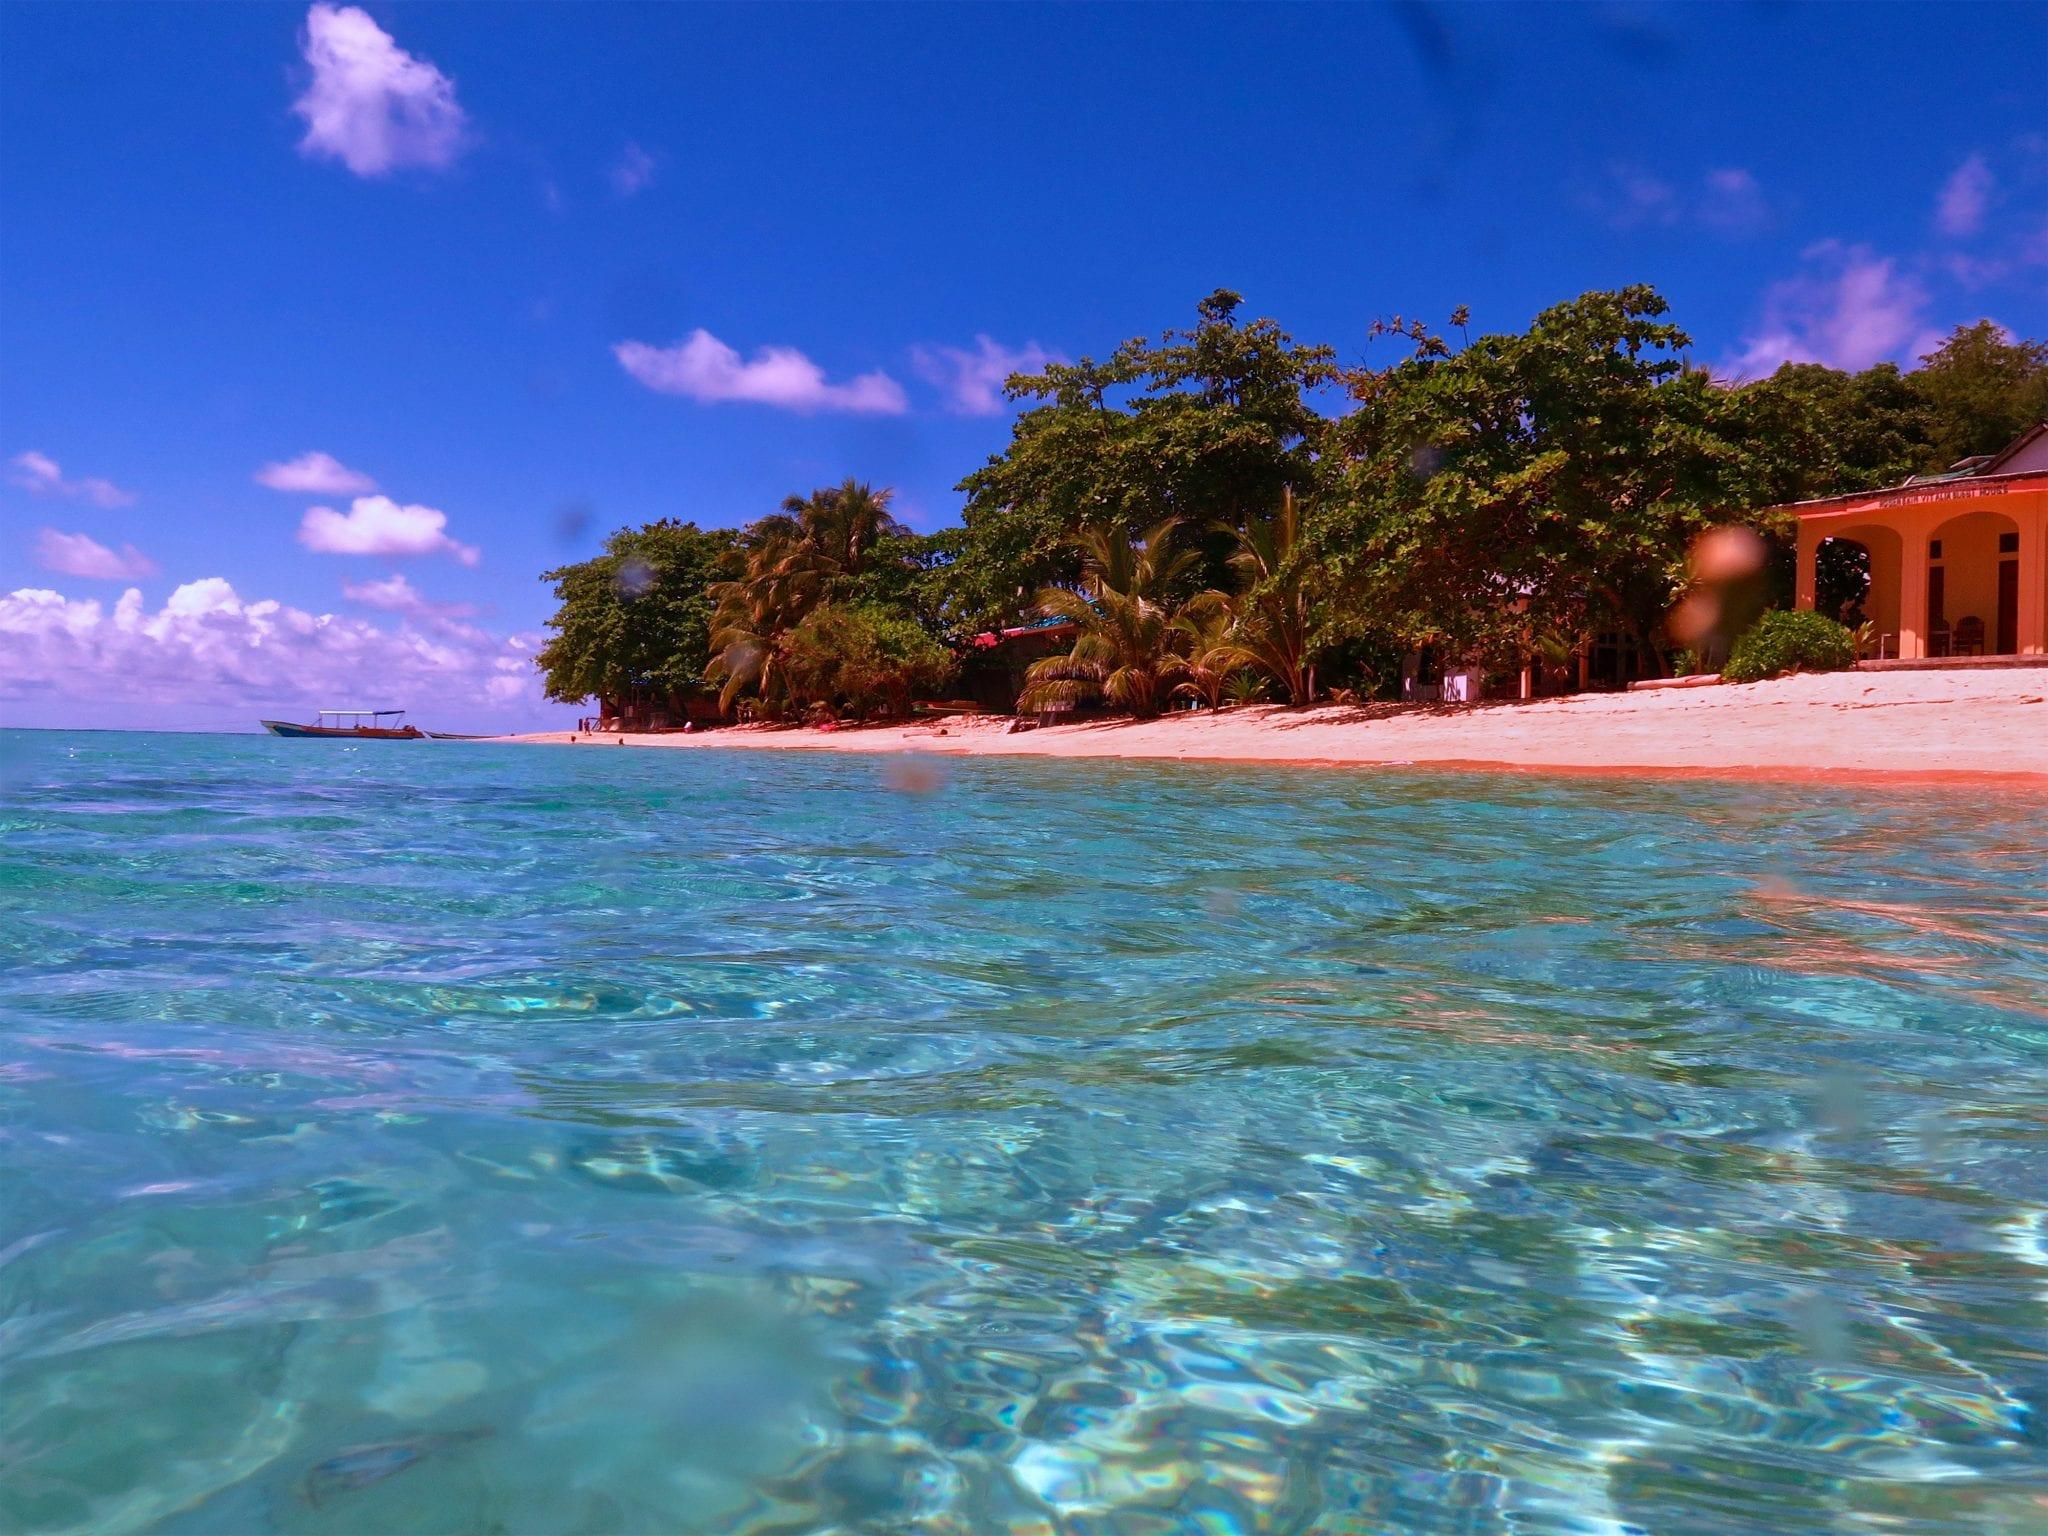 Banda-Hatta, острова Банда